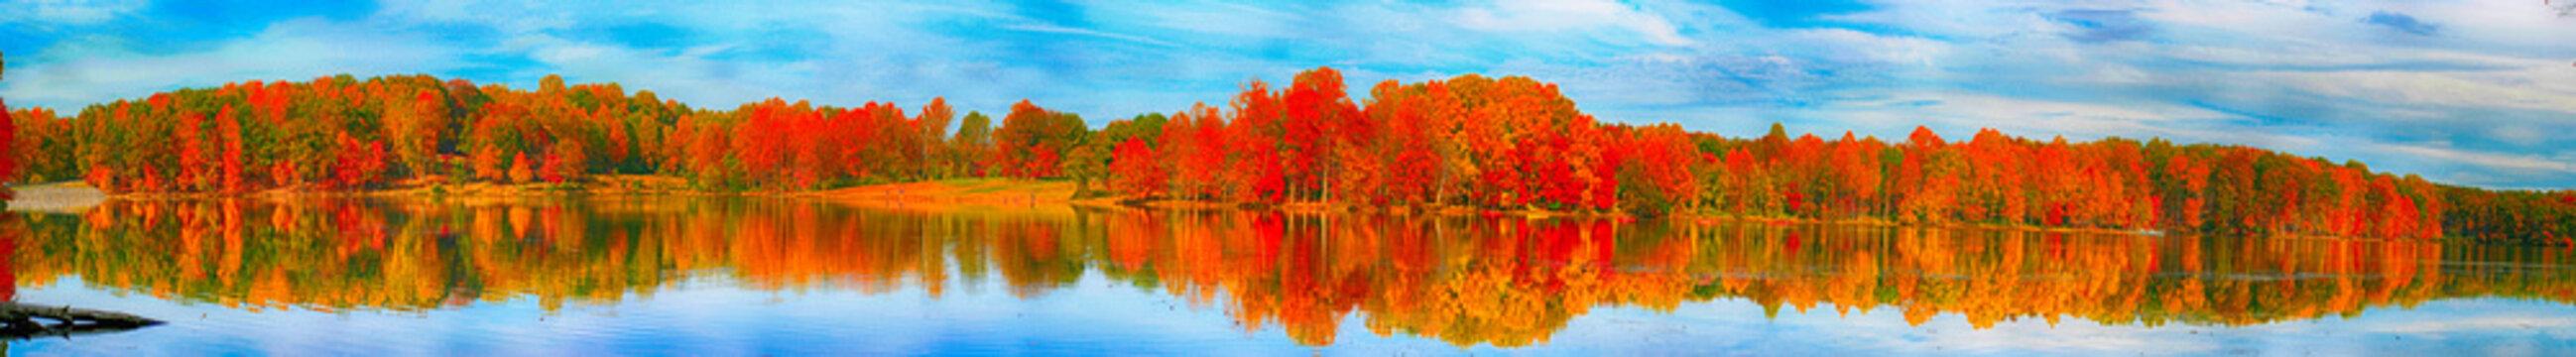 Fall Colours Panorama, Seneca Lake, Germantown, Maryland